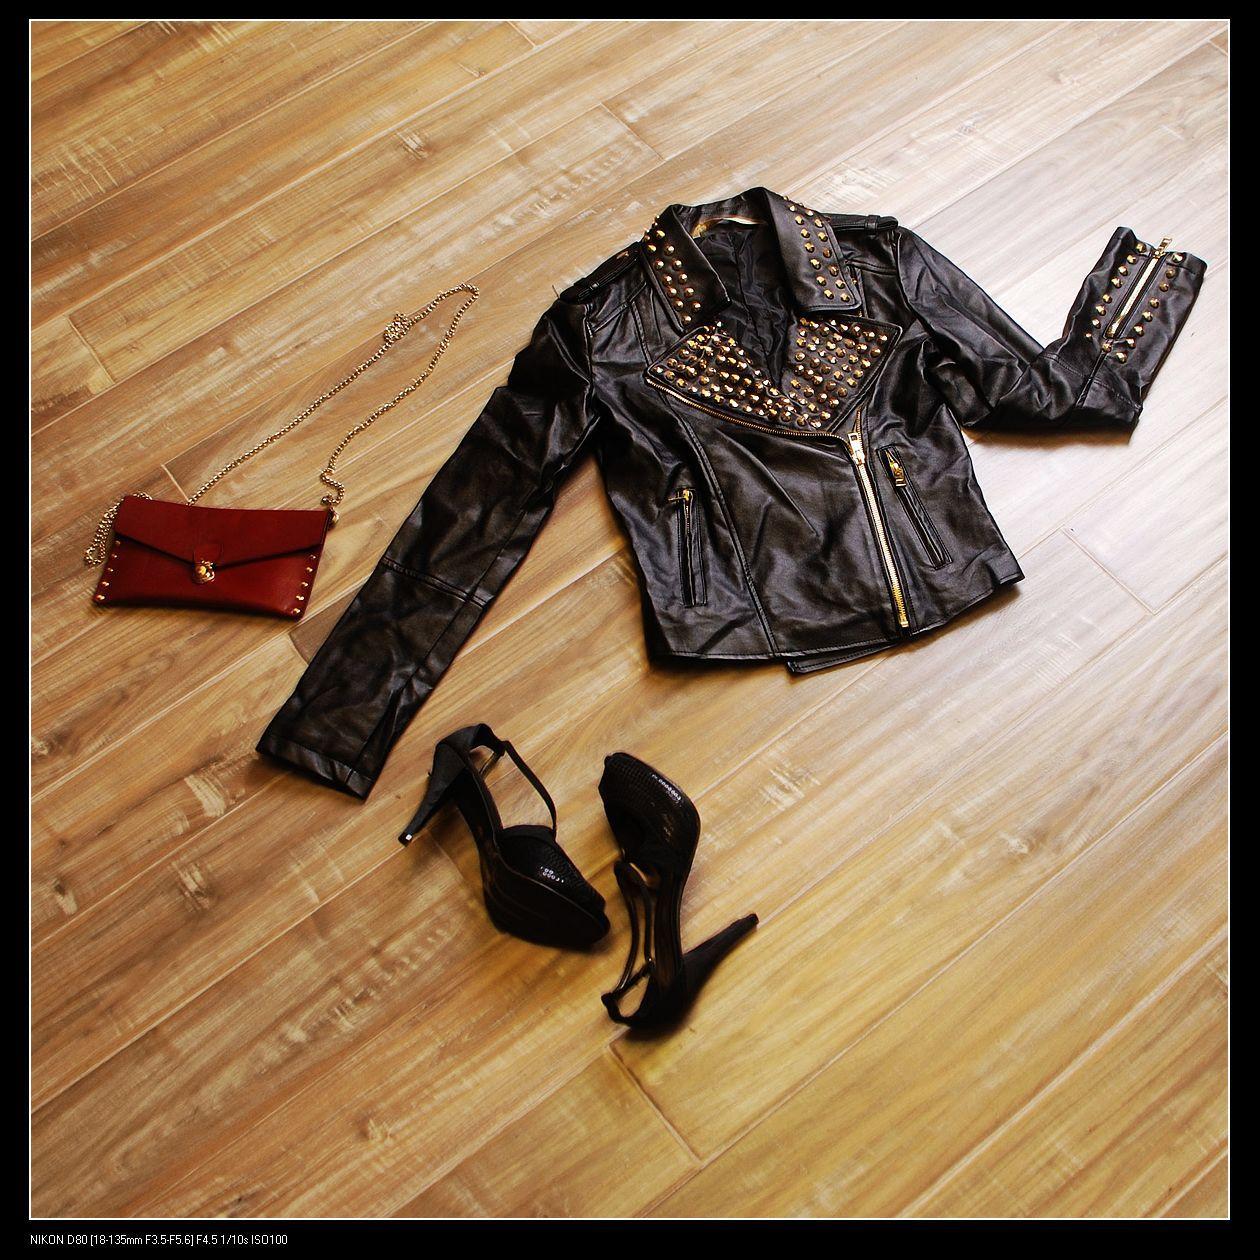 Кожаная куртка 2012 春秋女装新款 欧美修身嘻哈时尚摇滚黑色女装 皮衣